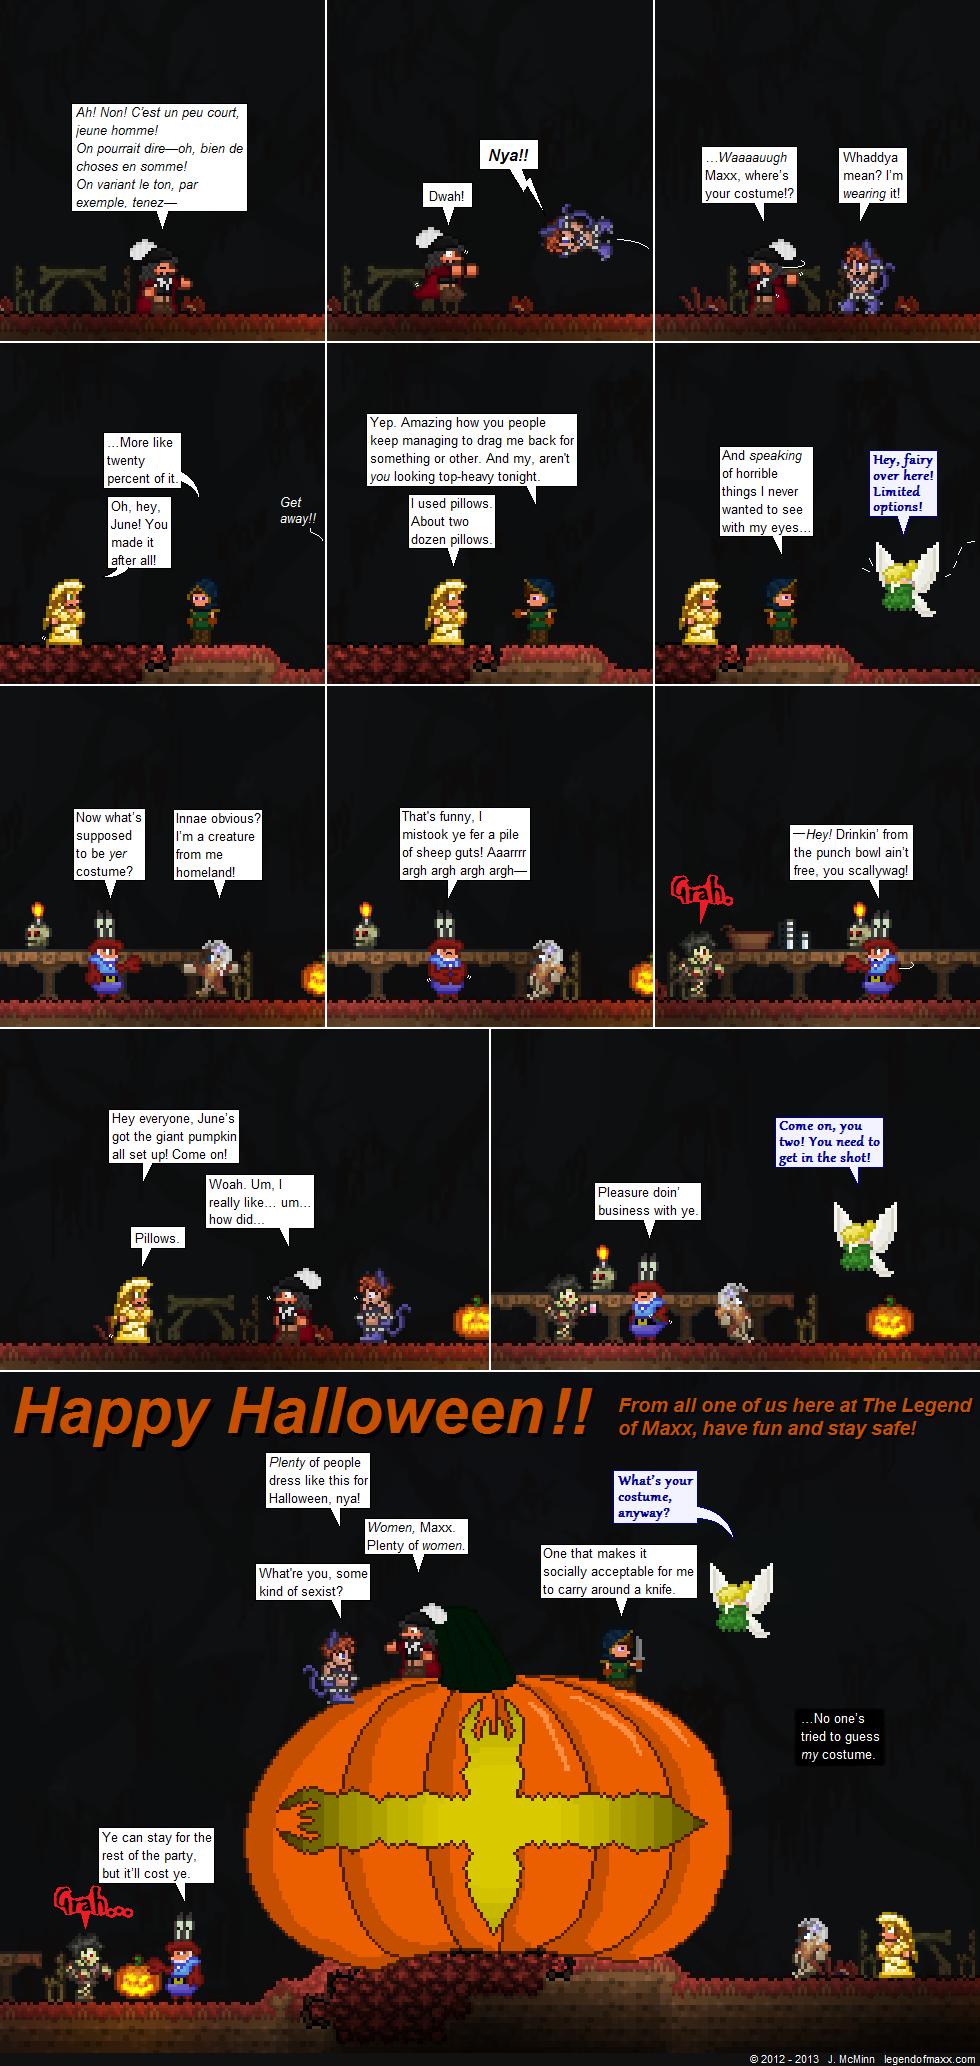 Halloween 2013!